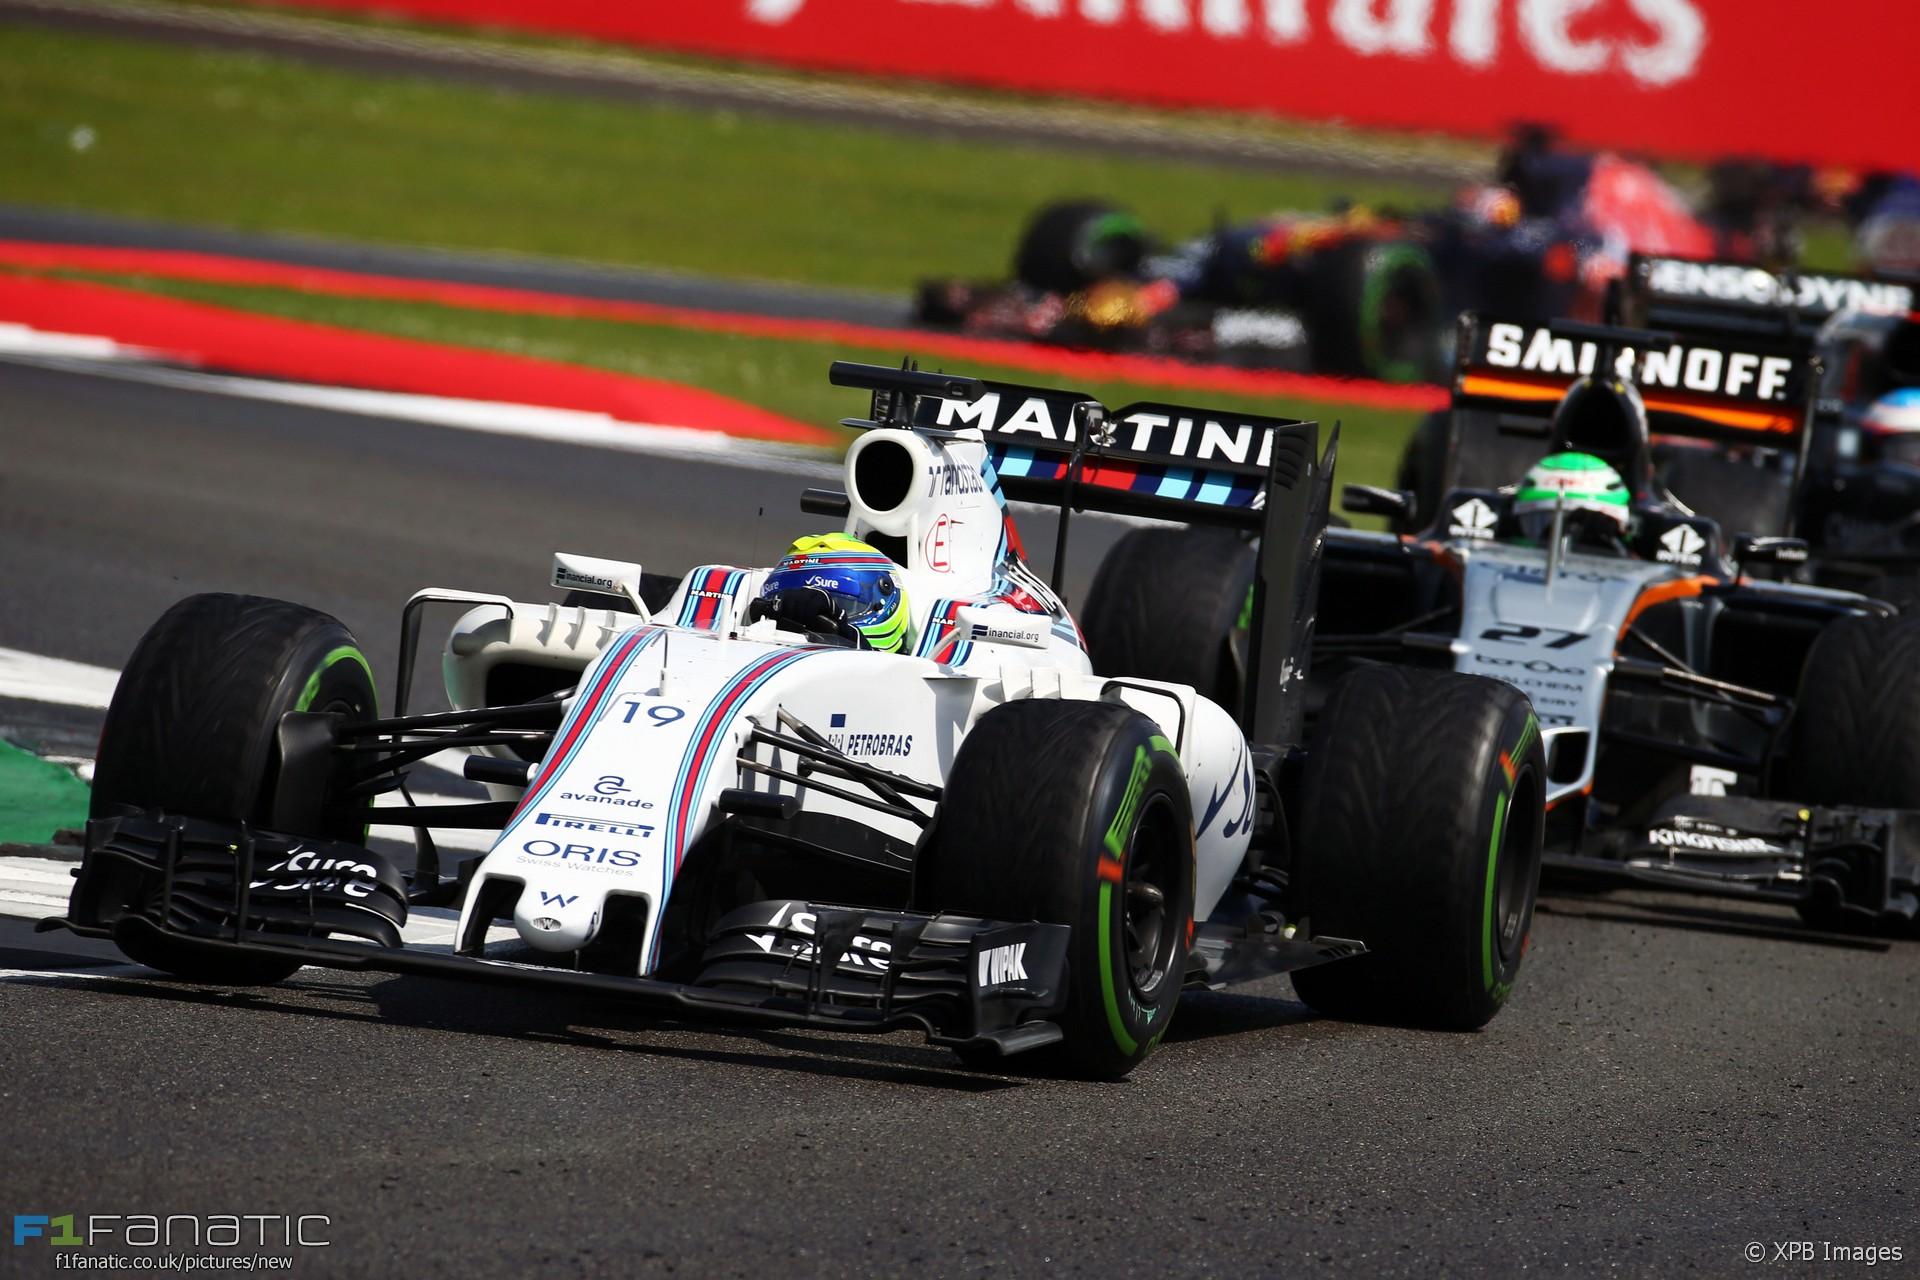 Felipe Massa, Williams, Silverstone, 2016